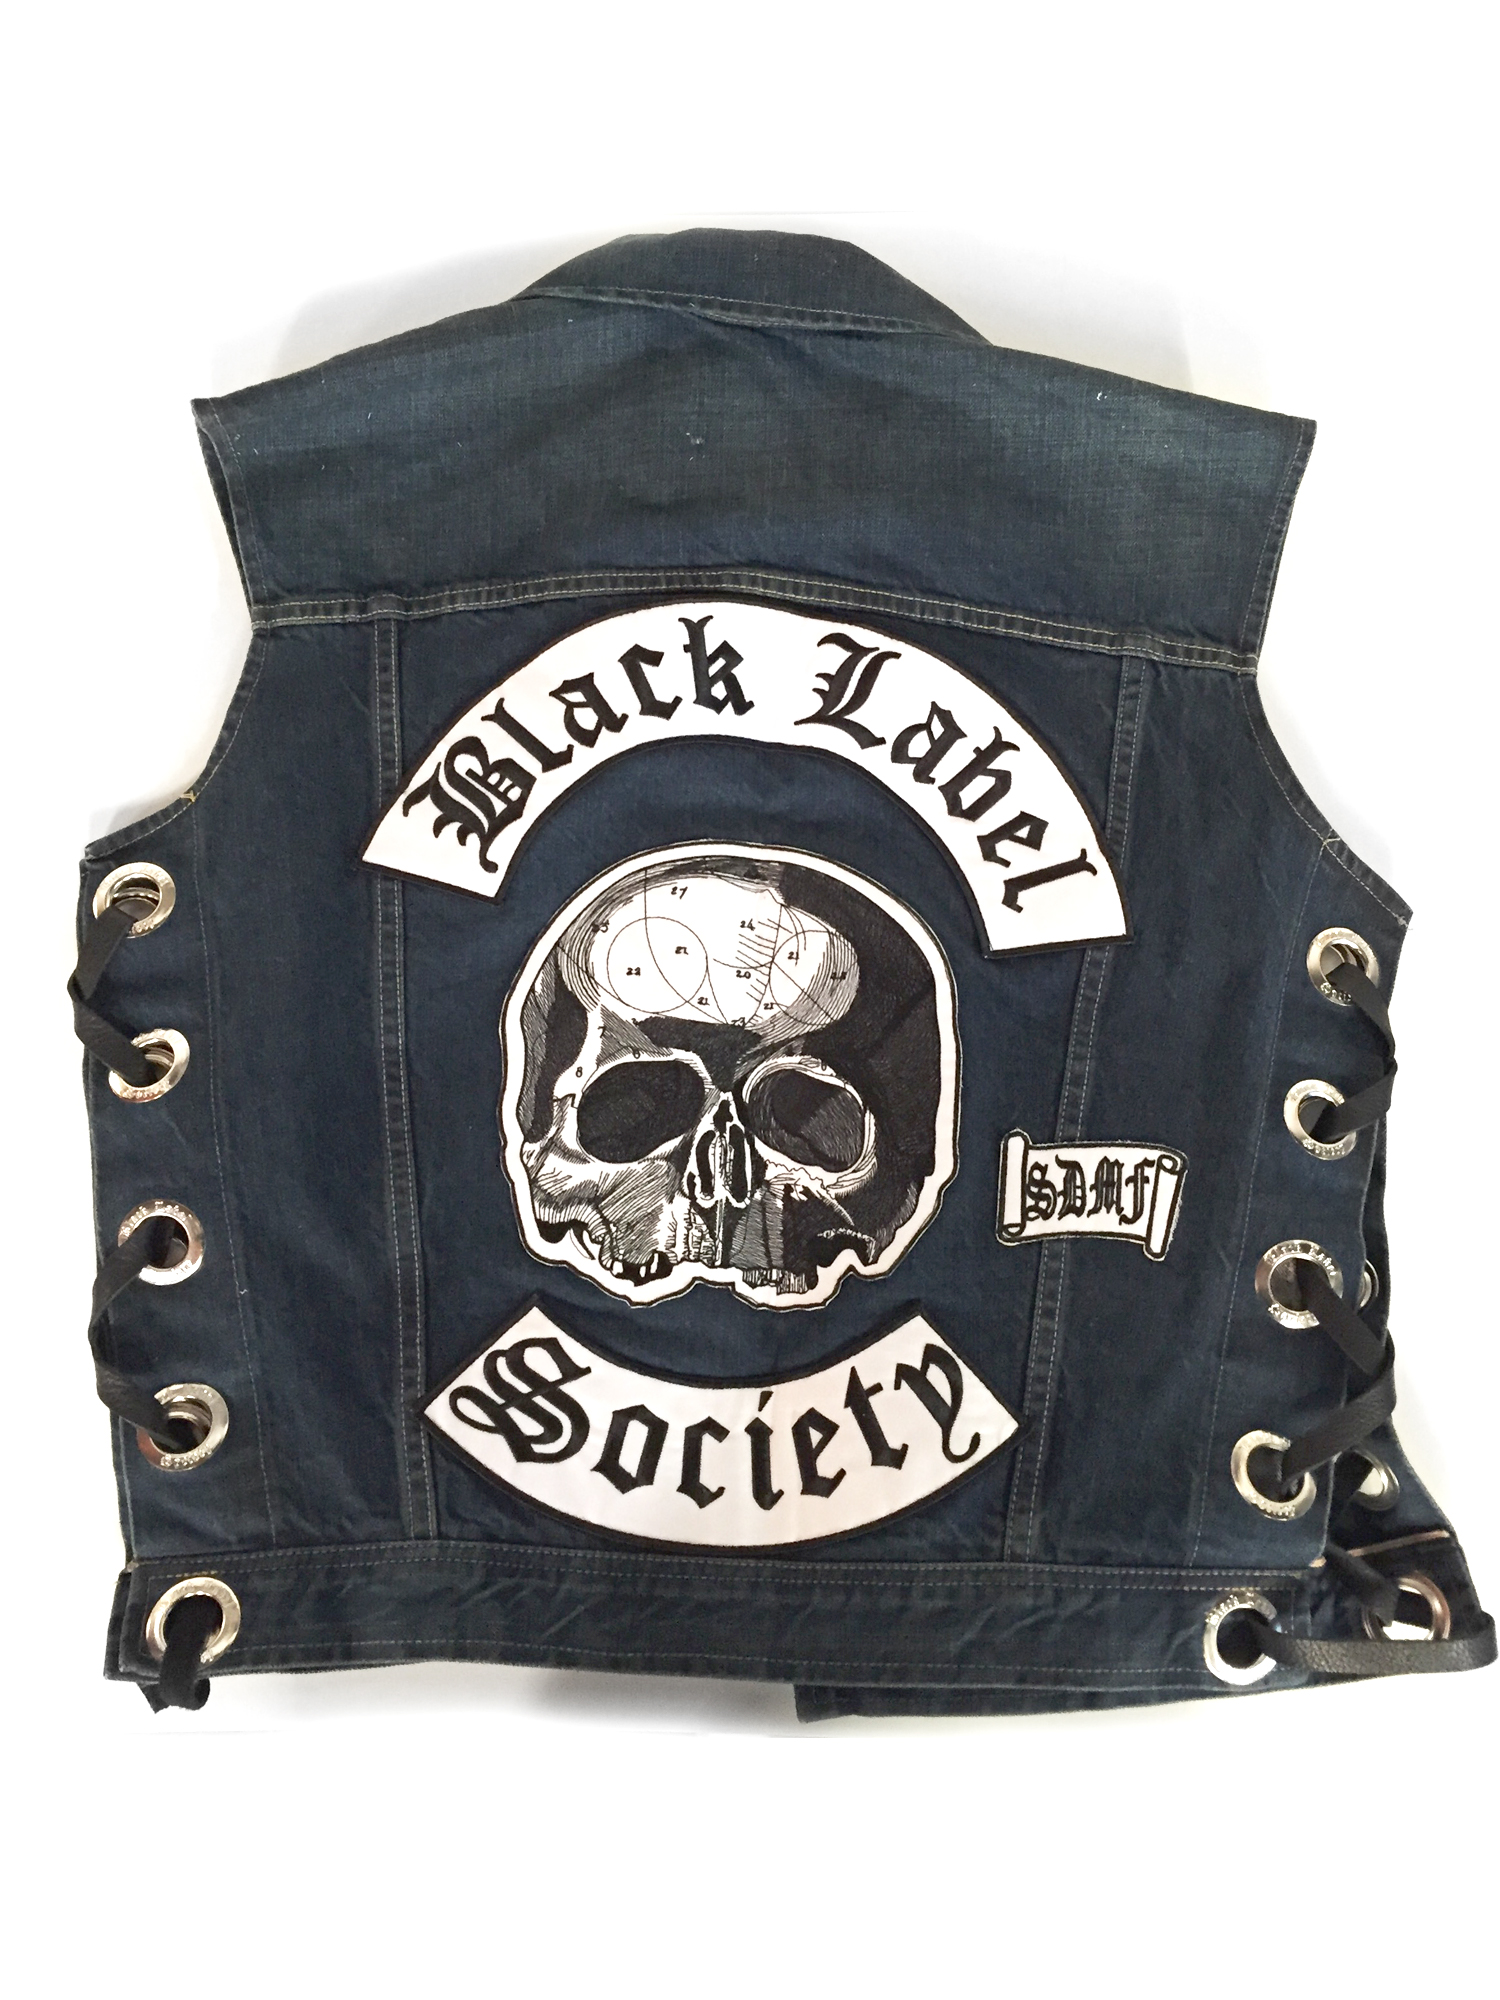 Black label society leather jacket